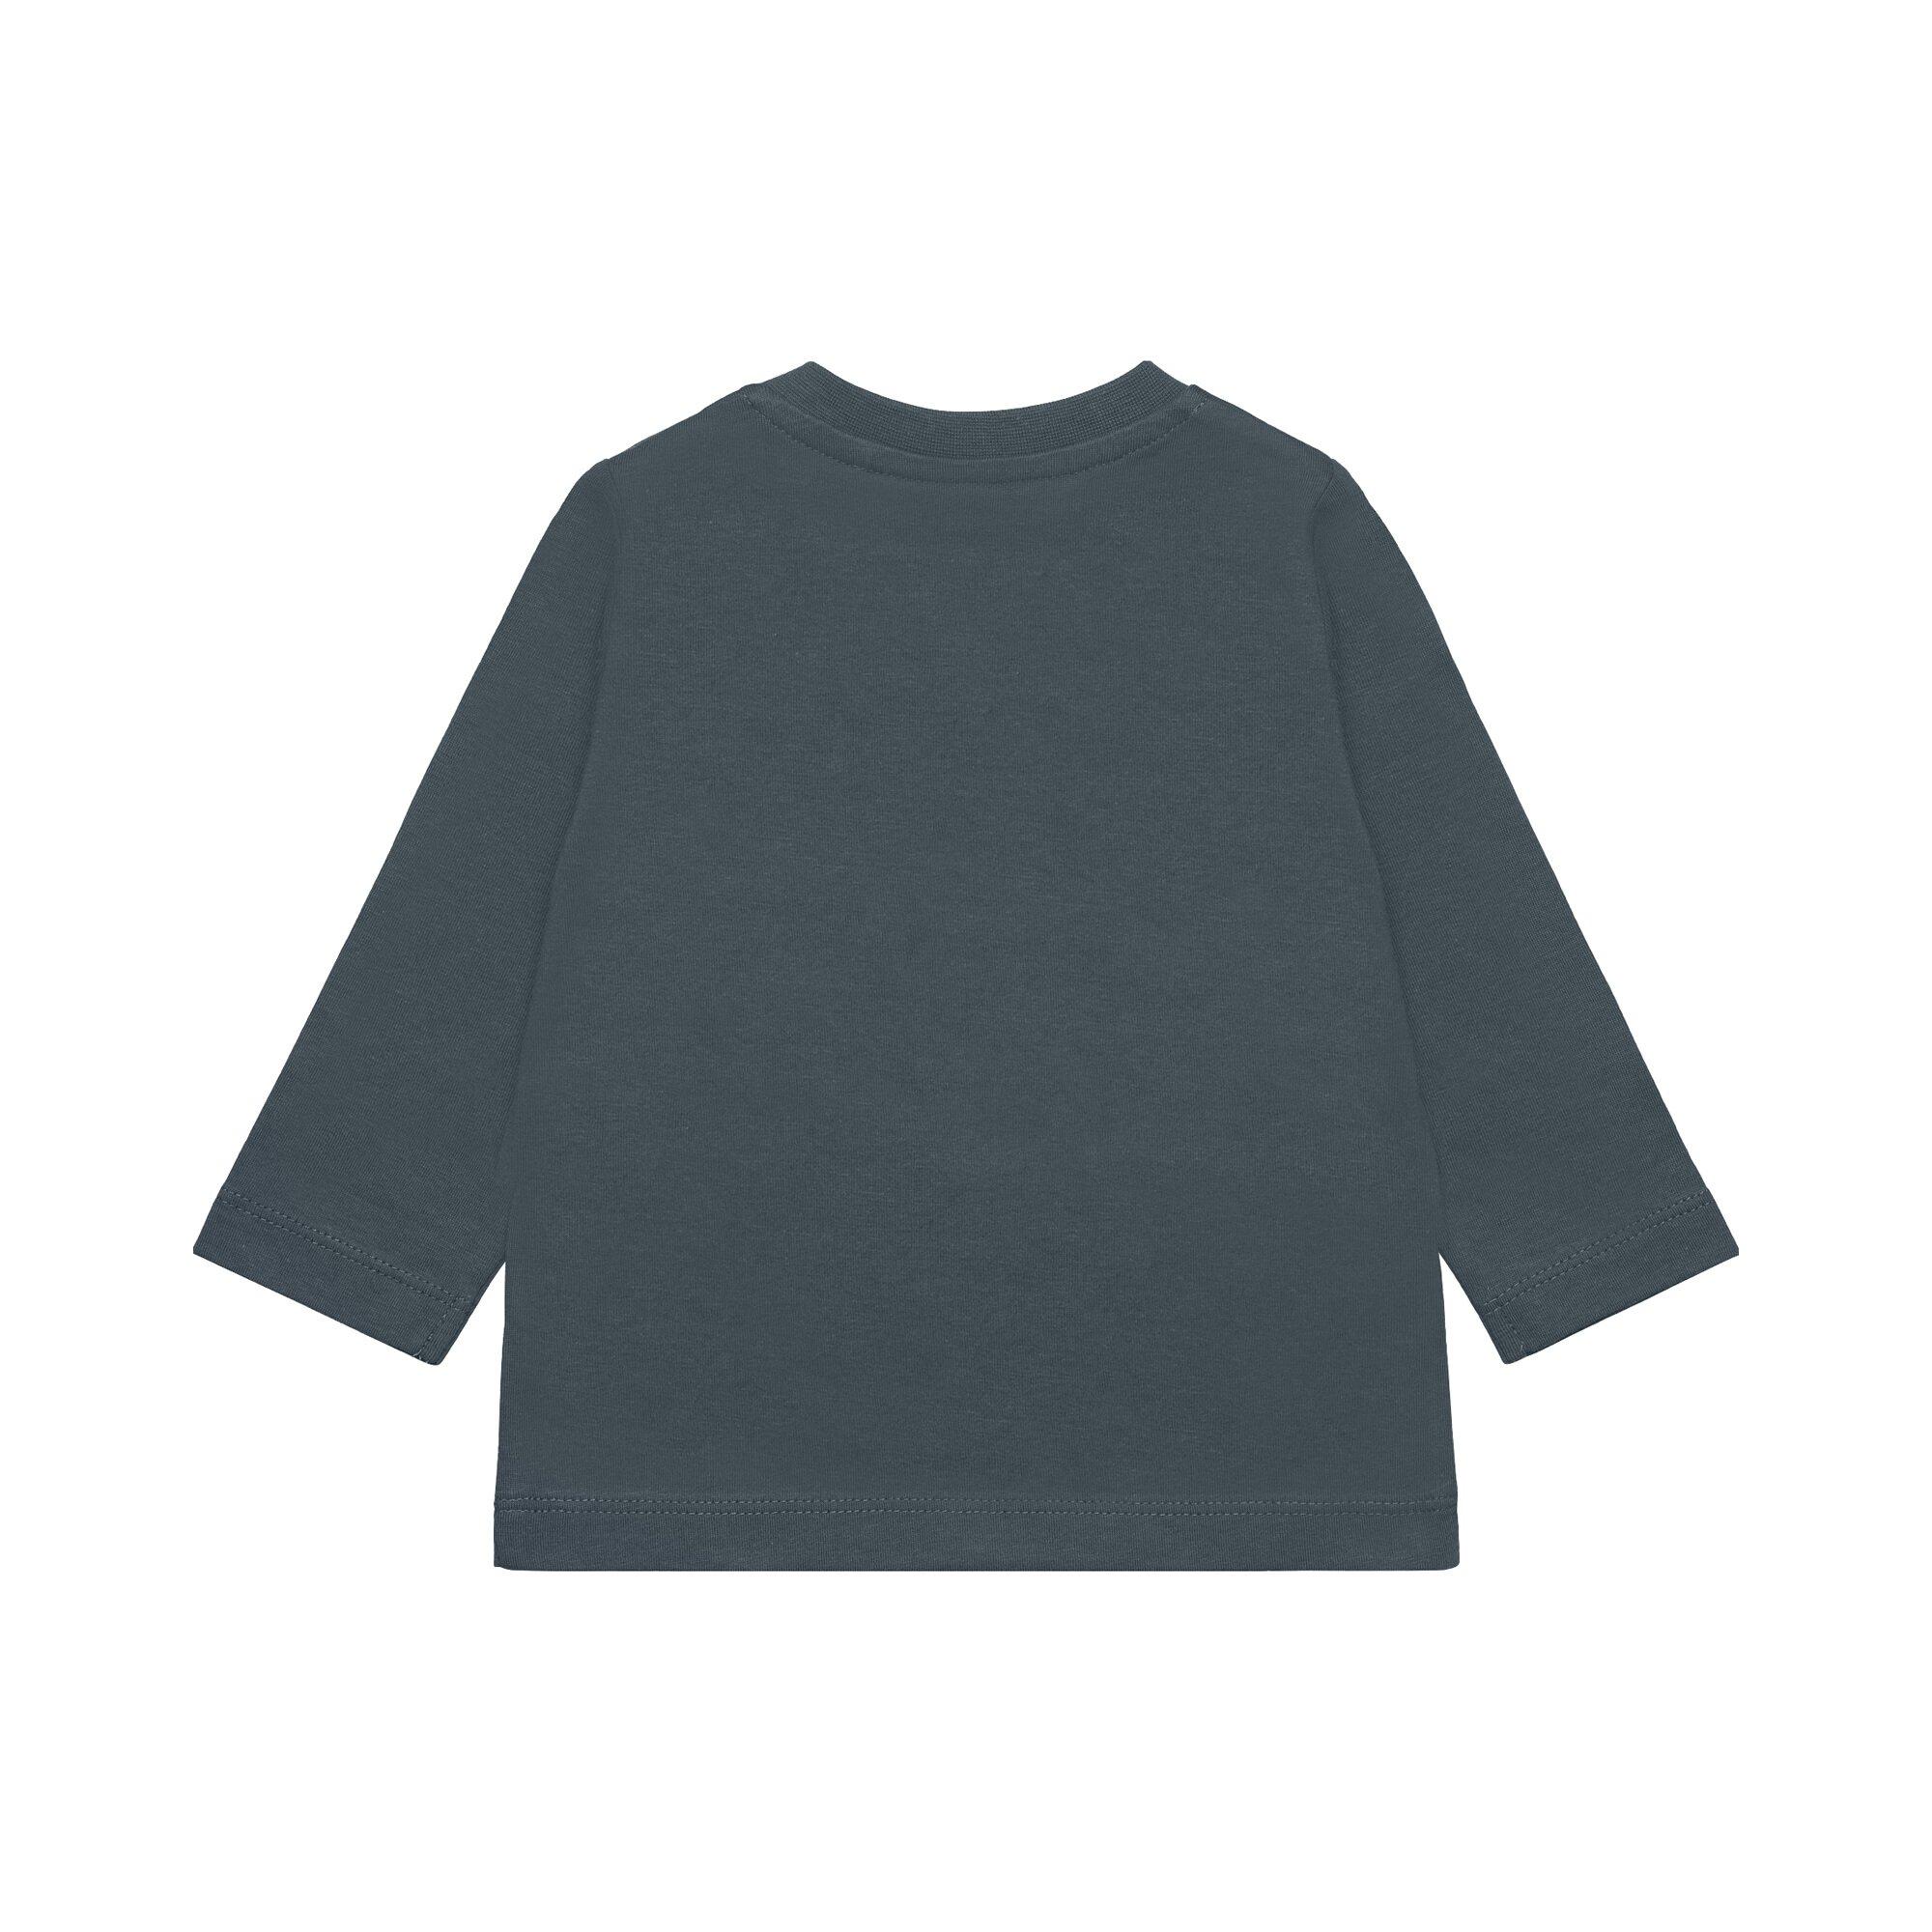 esprit-shirt-langarm-gesicht